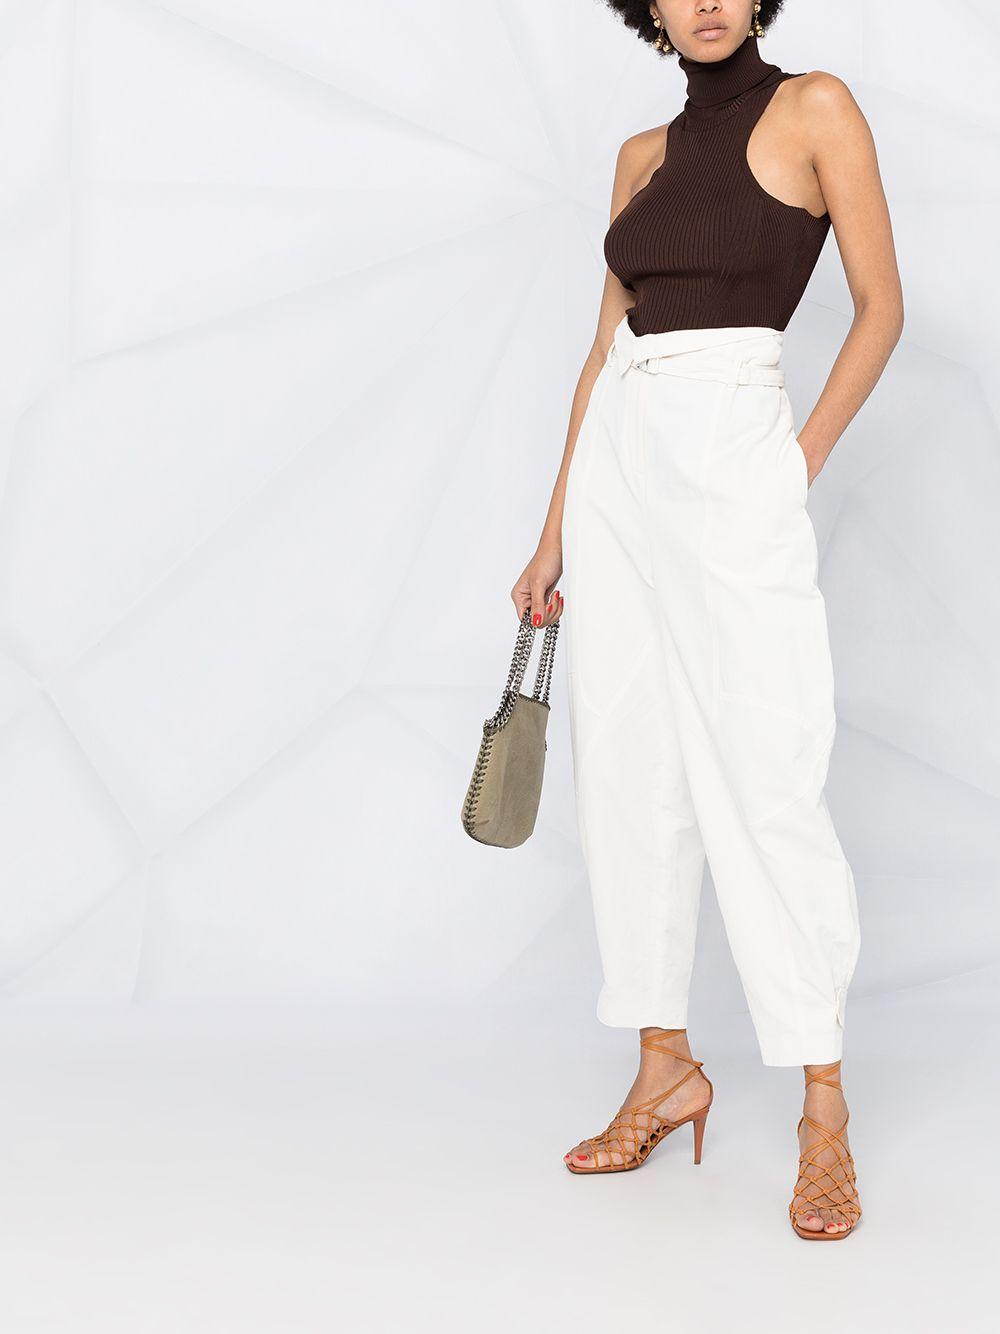 Pantaloni bianchi a vita alta affusolati in eco-cotone e lino STELLA MC CARTNEY | Pantaloni | 602991-SIA039200